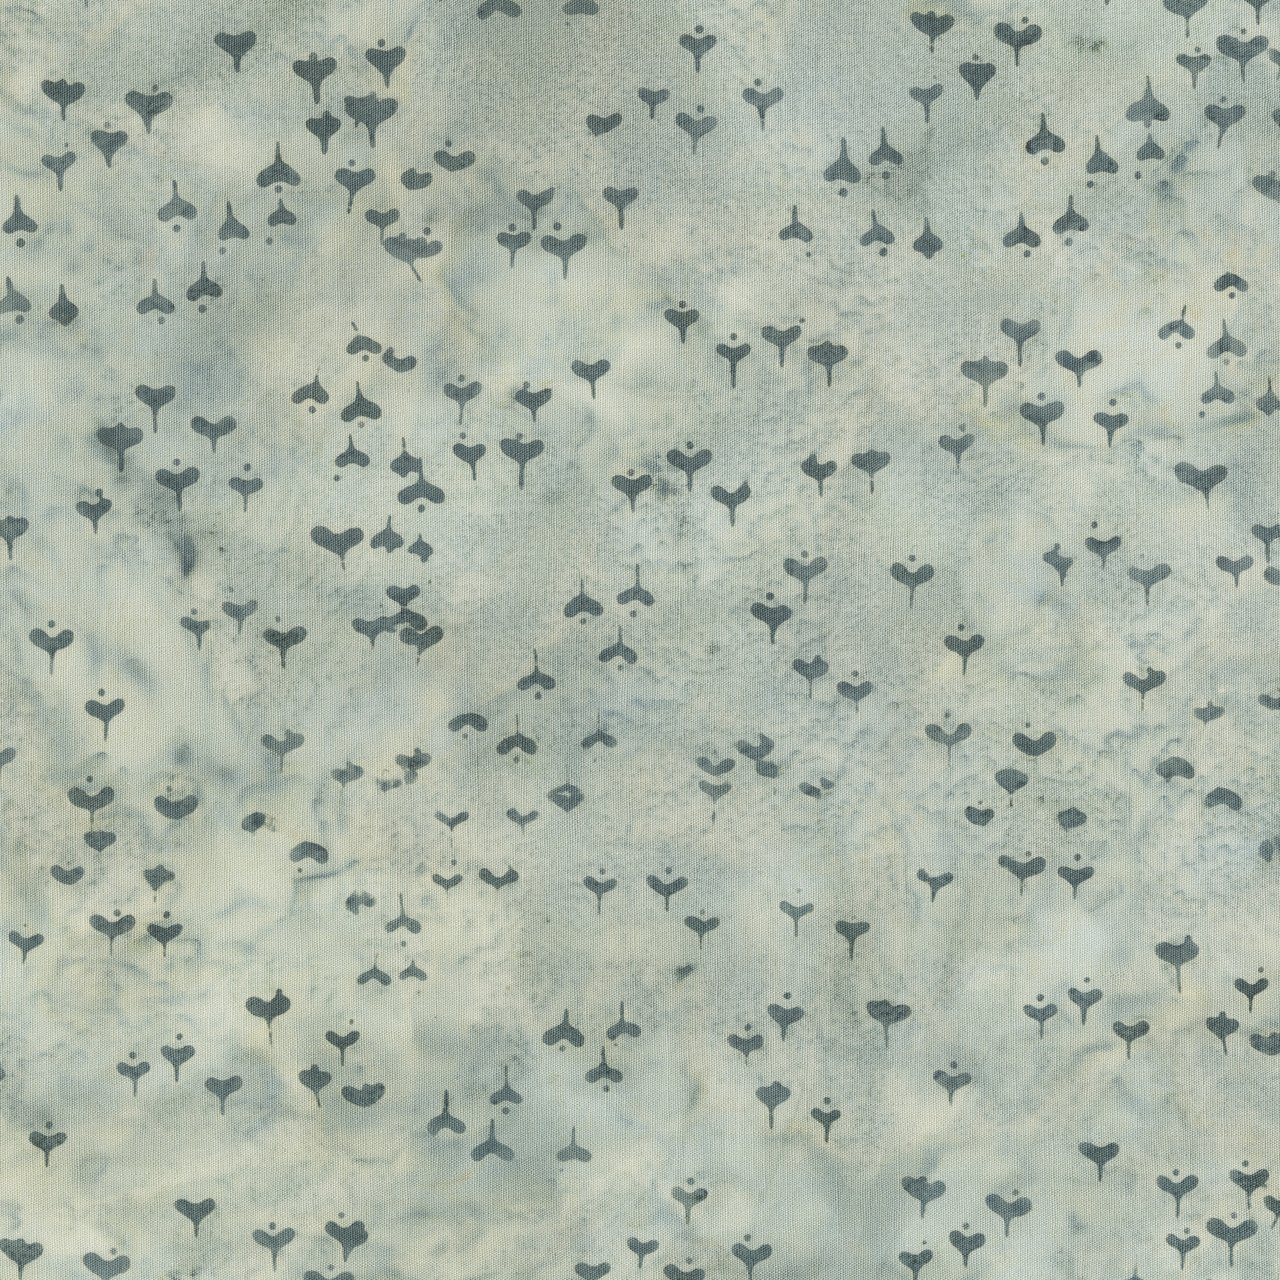 Grey MC Escher's Relativity 234Q-16 Art Inspired batiks from Anthology Fabrics